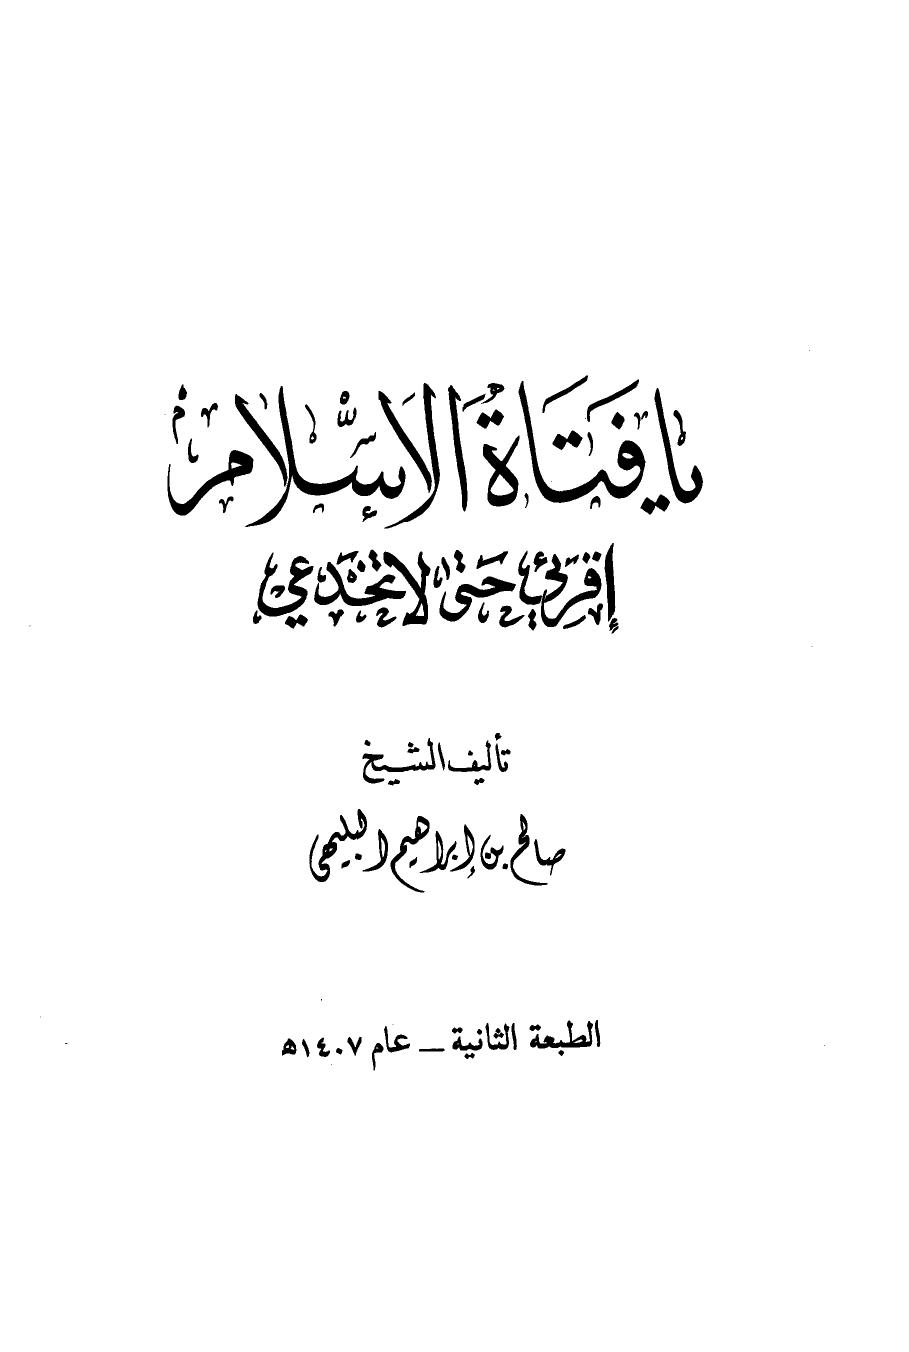 Photo of يا فتاة الإسلام اقرئي حتى لا تخدعي